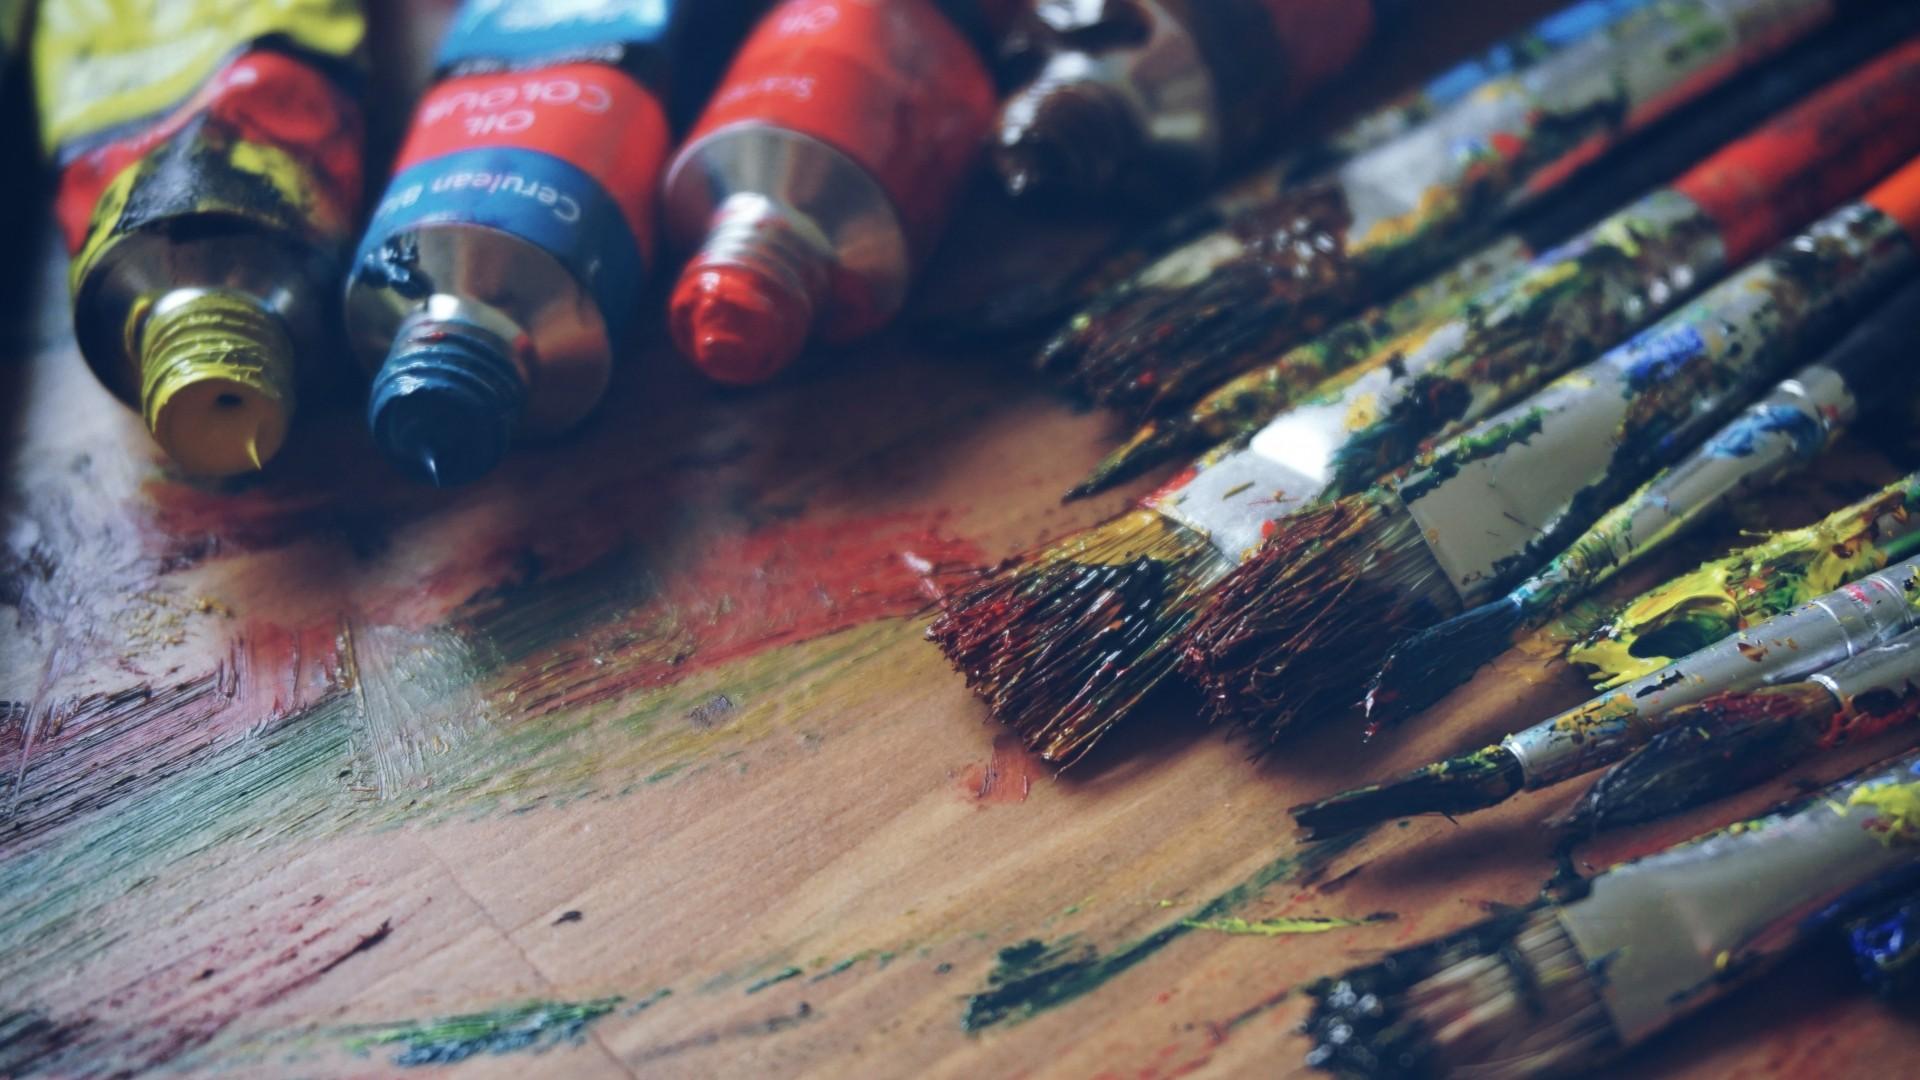 warme farben malerei, hintergrundbilder : bunt, malerei, rot, blau, pinsel, warme farben, Innenarchitektur